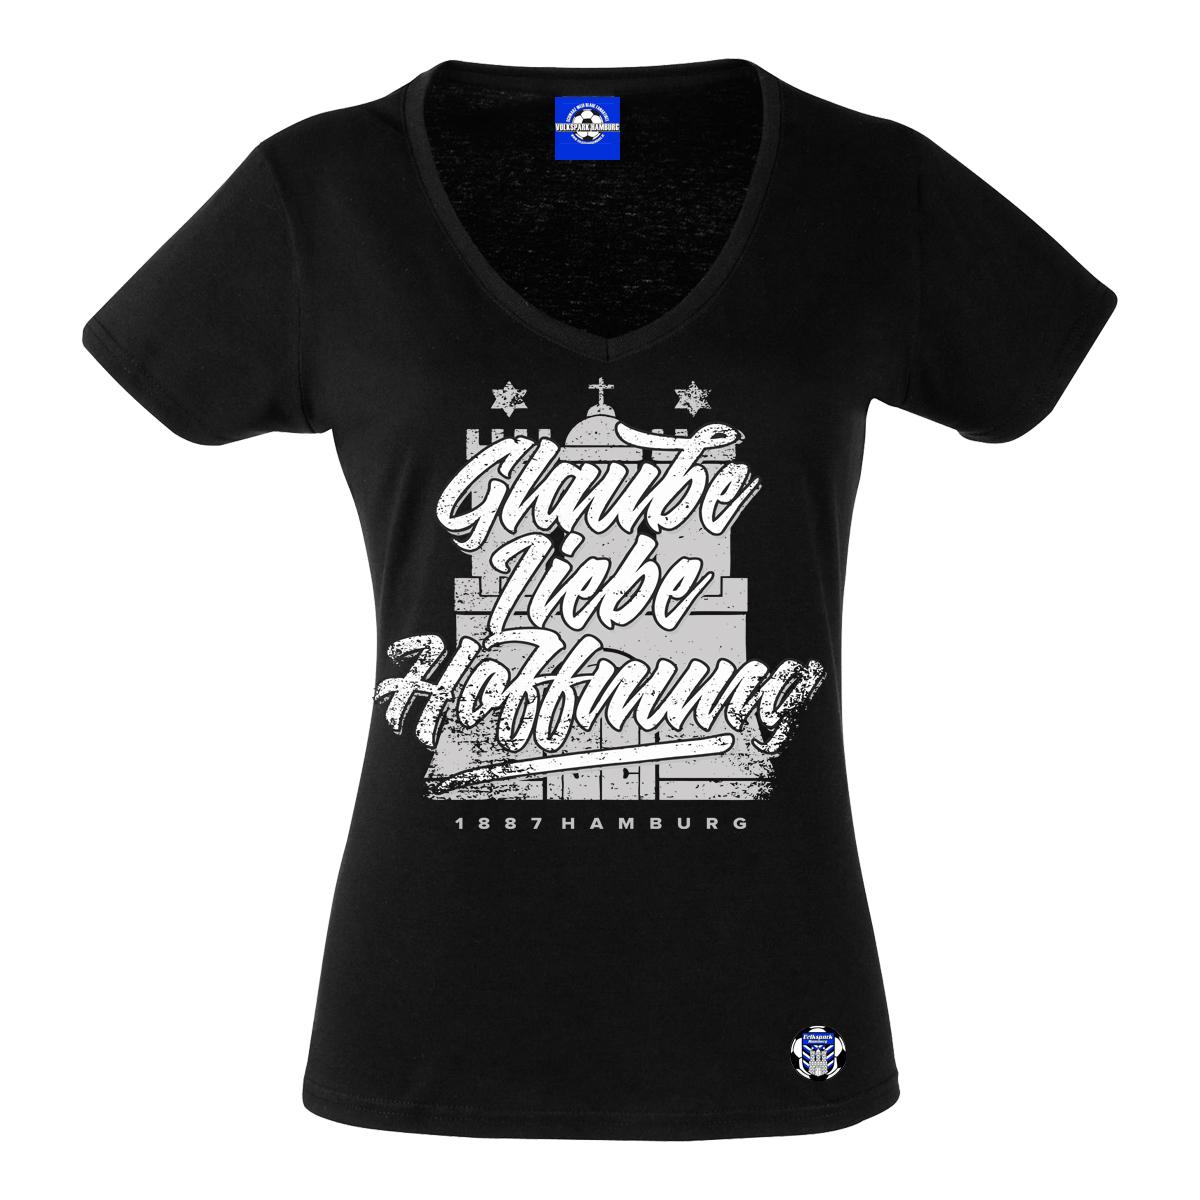 Volkspark Hamburg Streetwear Shirt GLH 2018